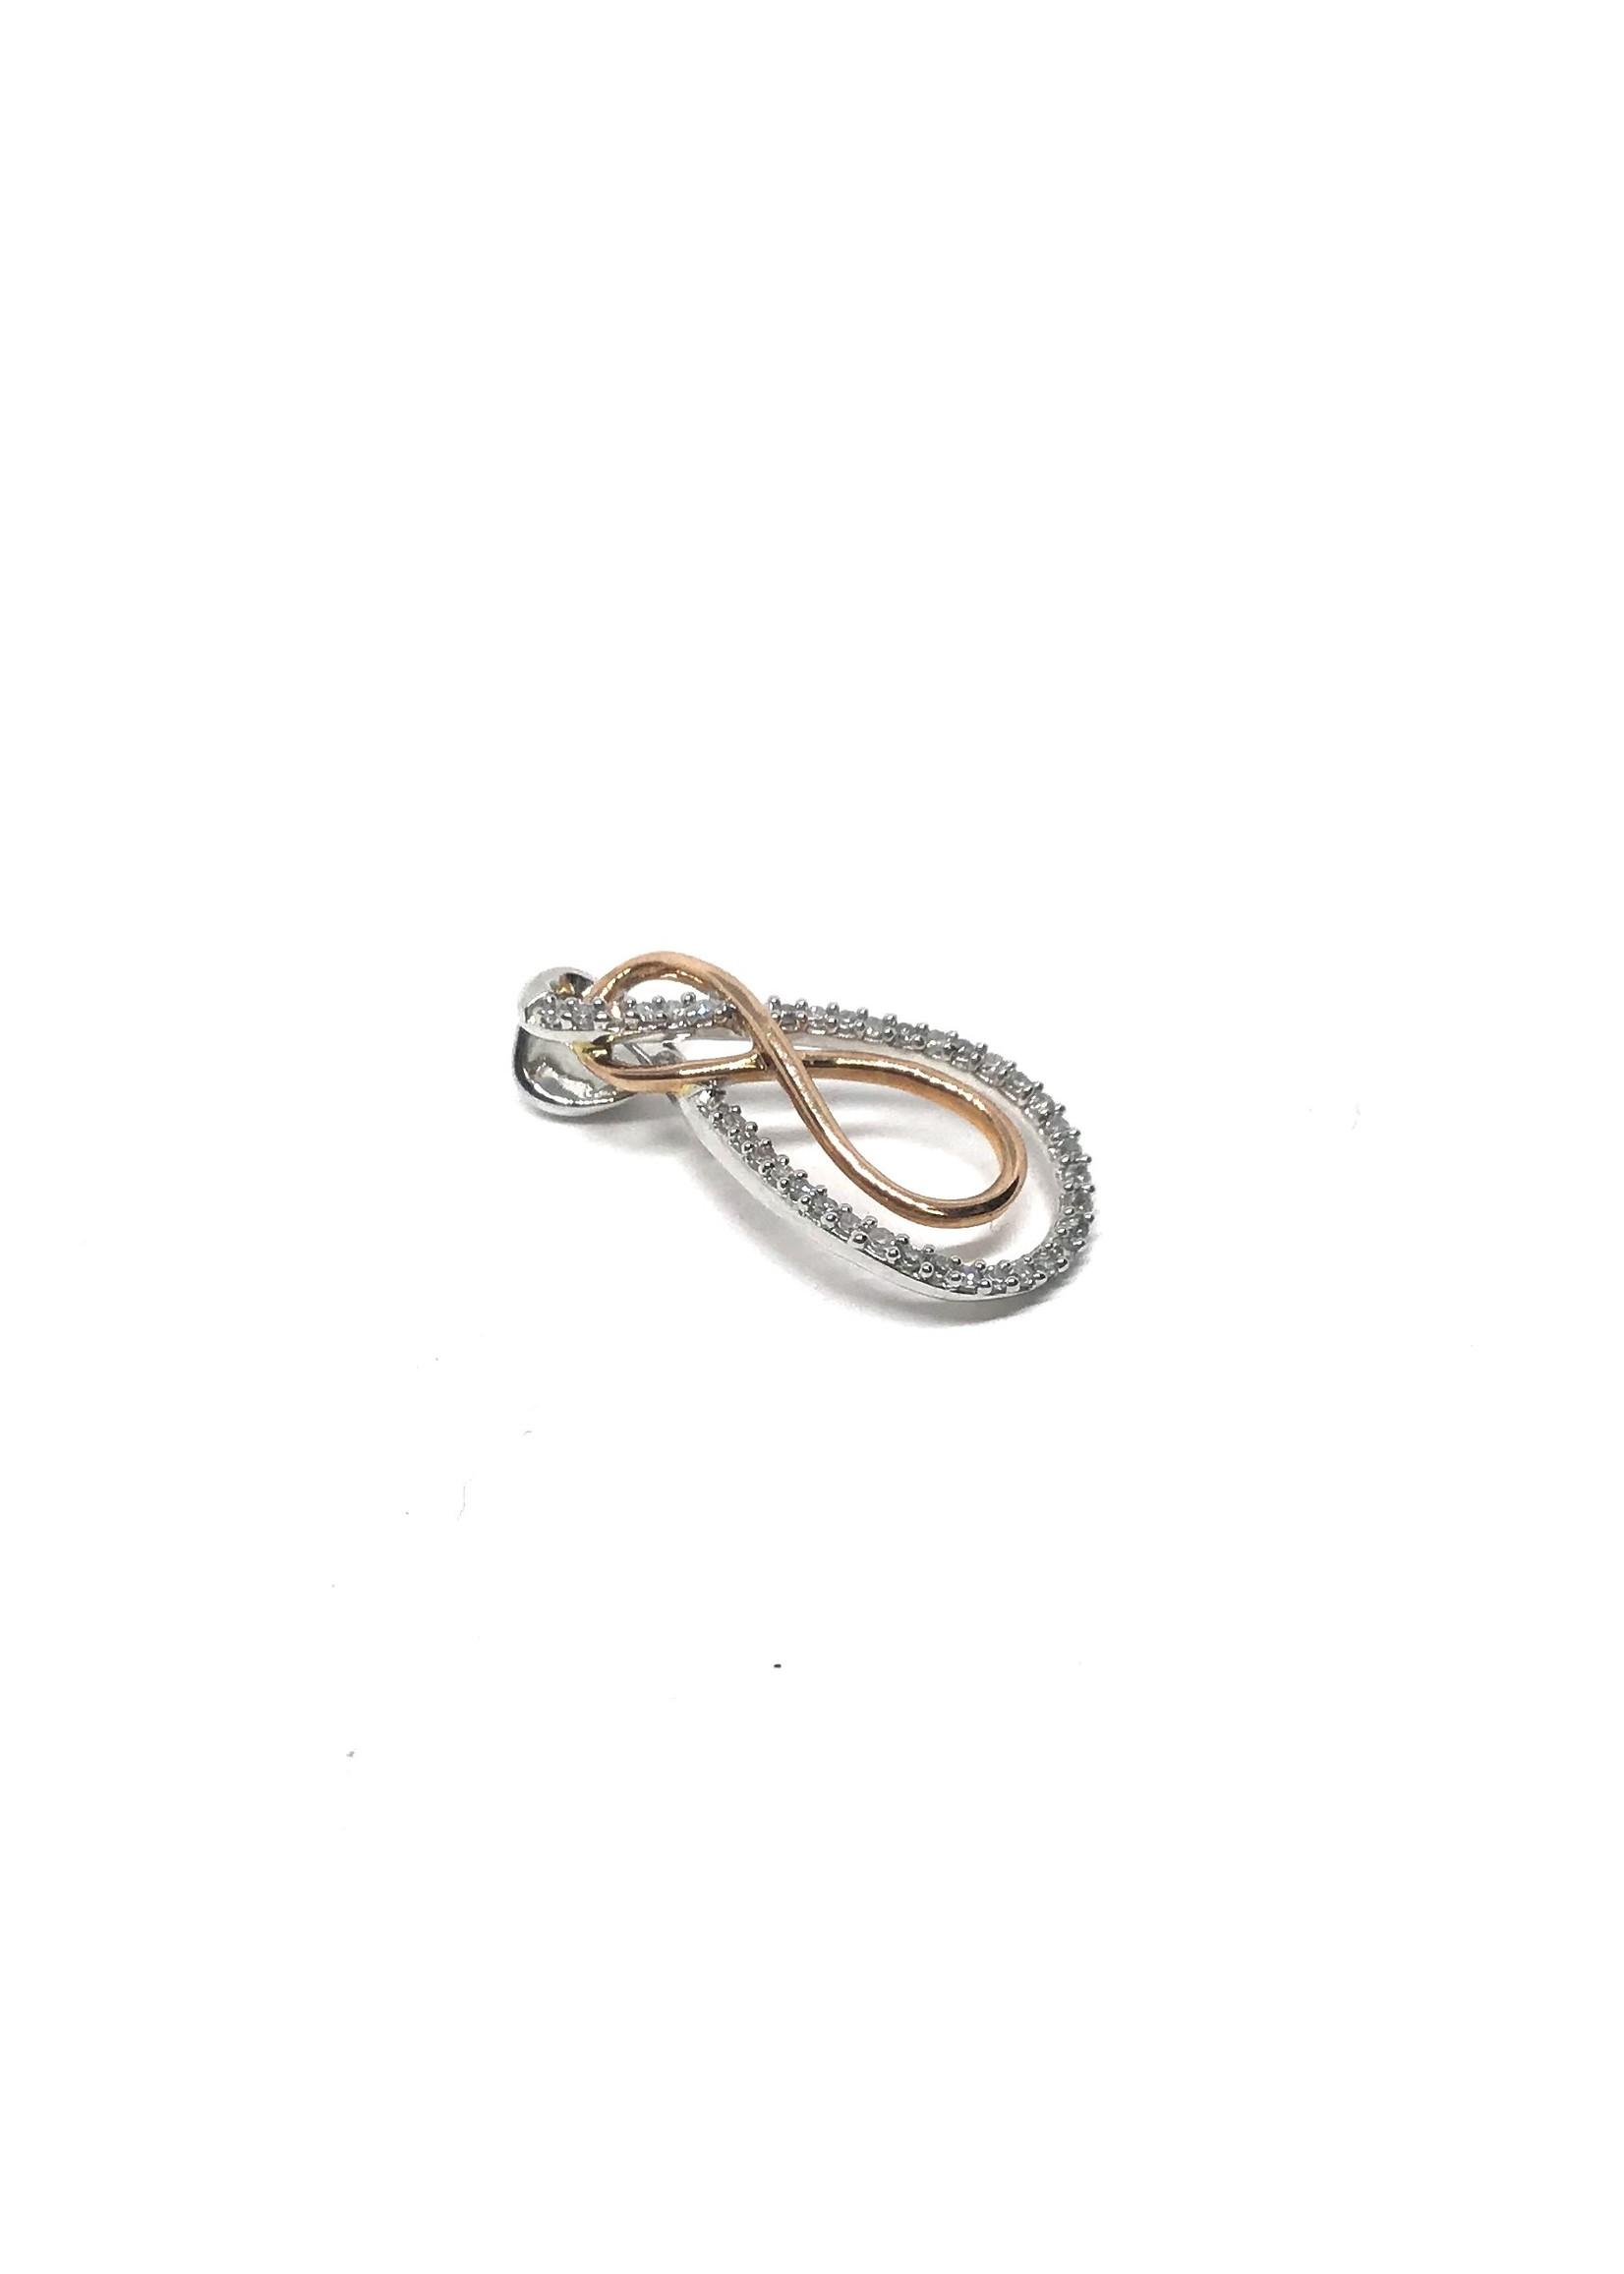 Collier Infini Or 10K 2 tons avec Diamants